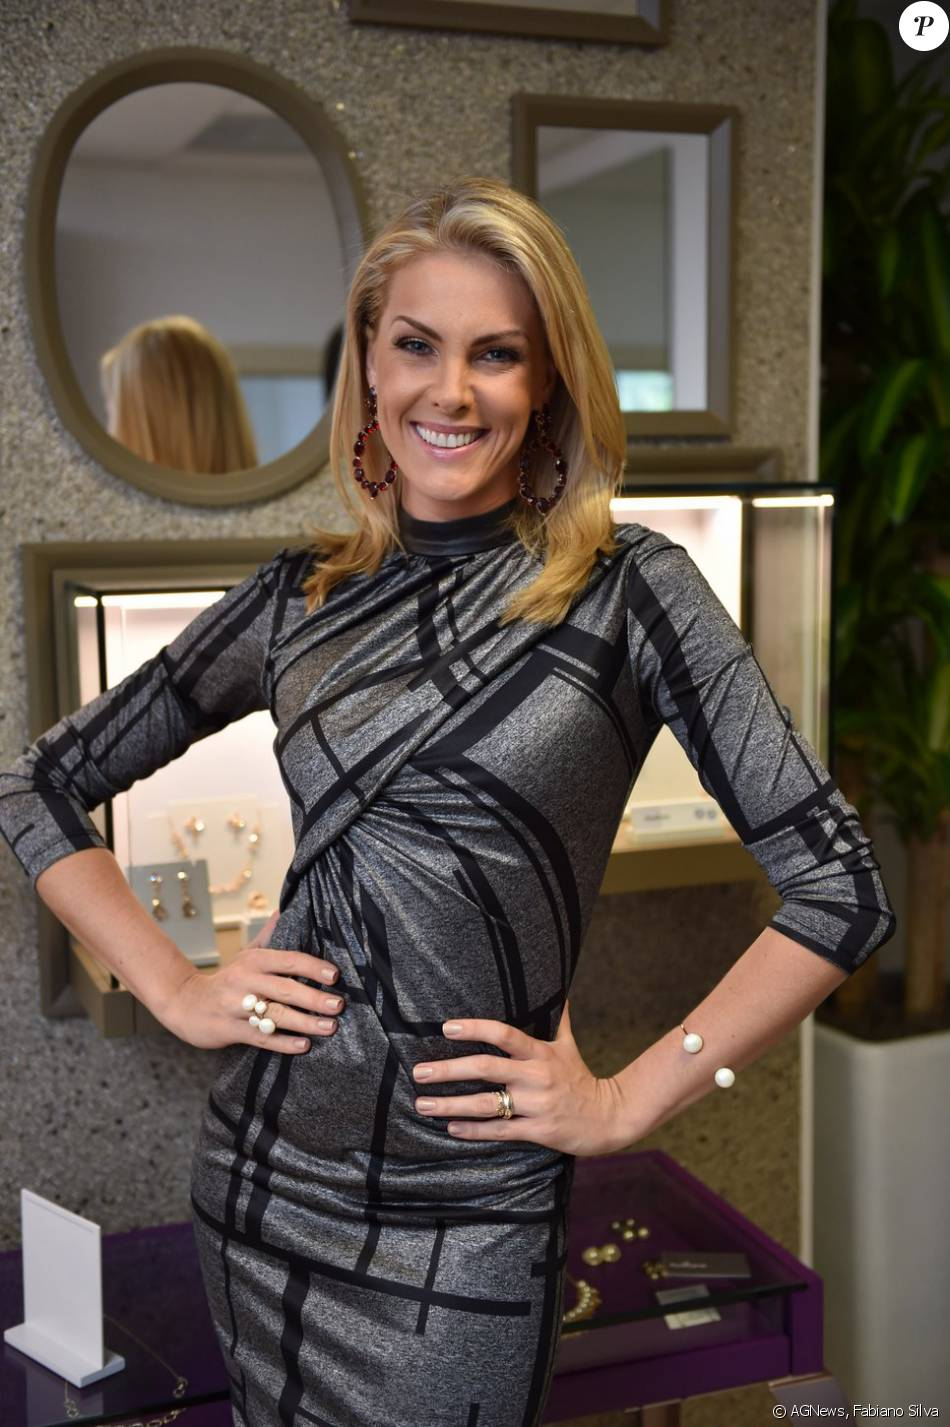 24c309df004ab Ana Hickmann lançou a linha de joias Heaven – Ana Hickmann Fashion Jewelry  by Rommanel, sua 13ª em parceria com a Rommanel